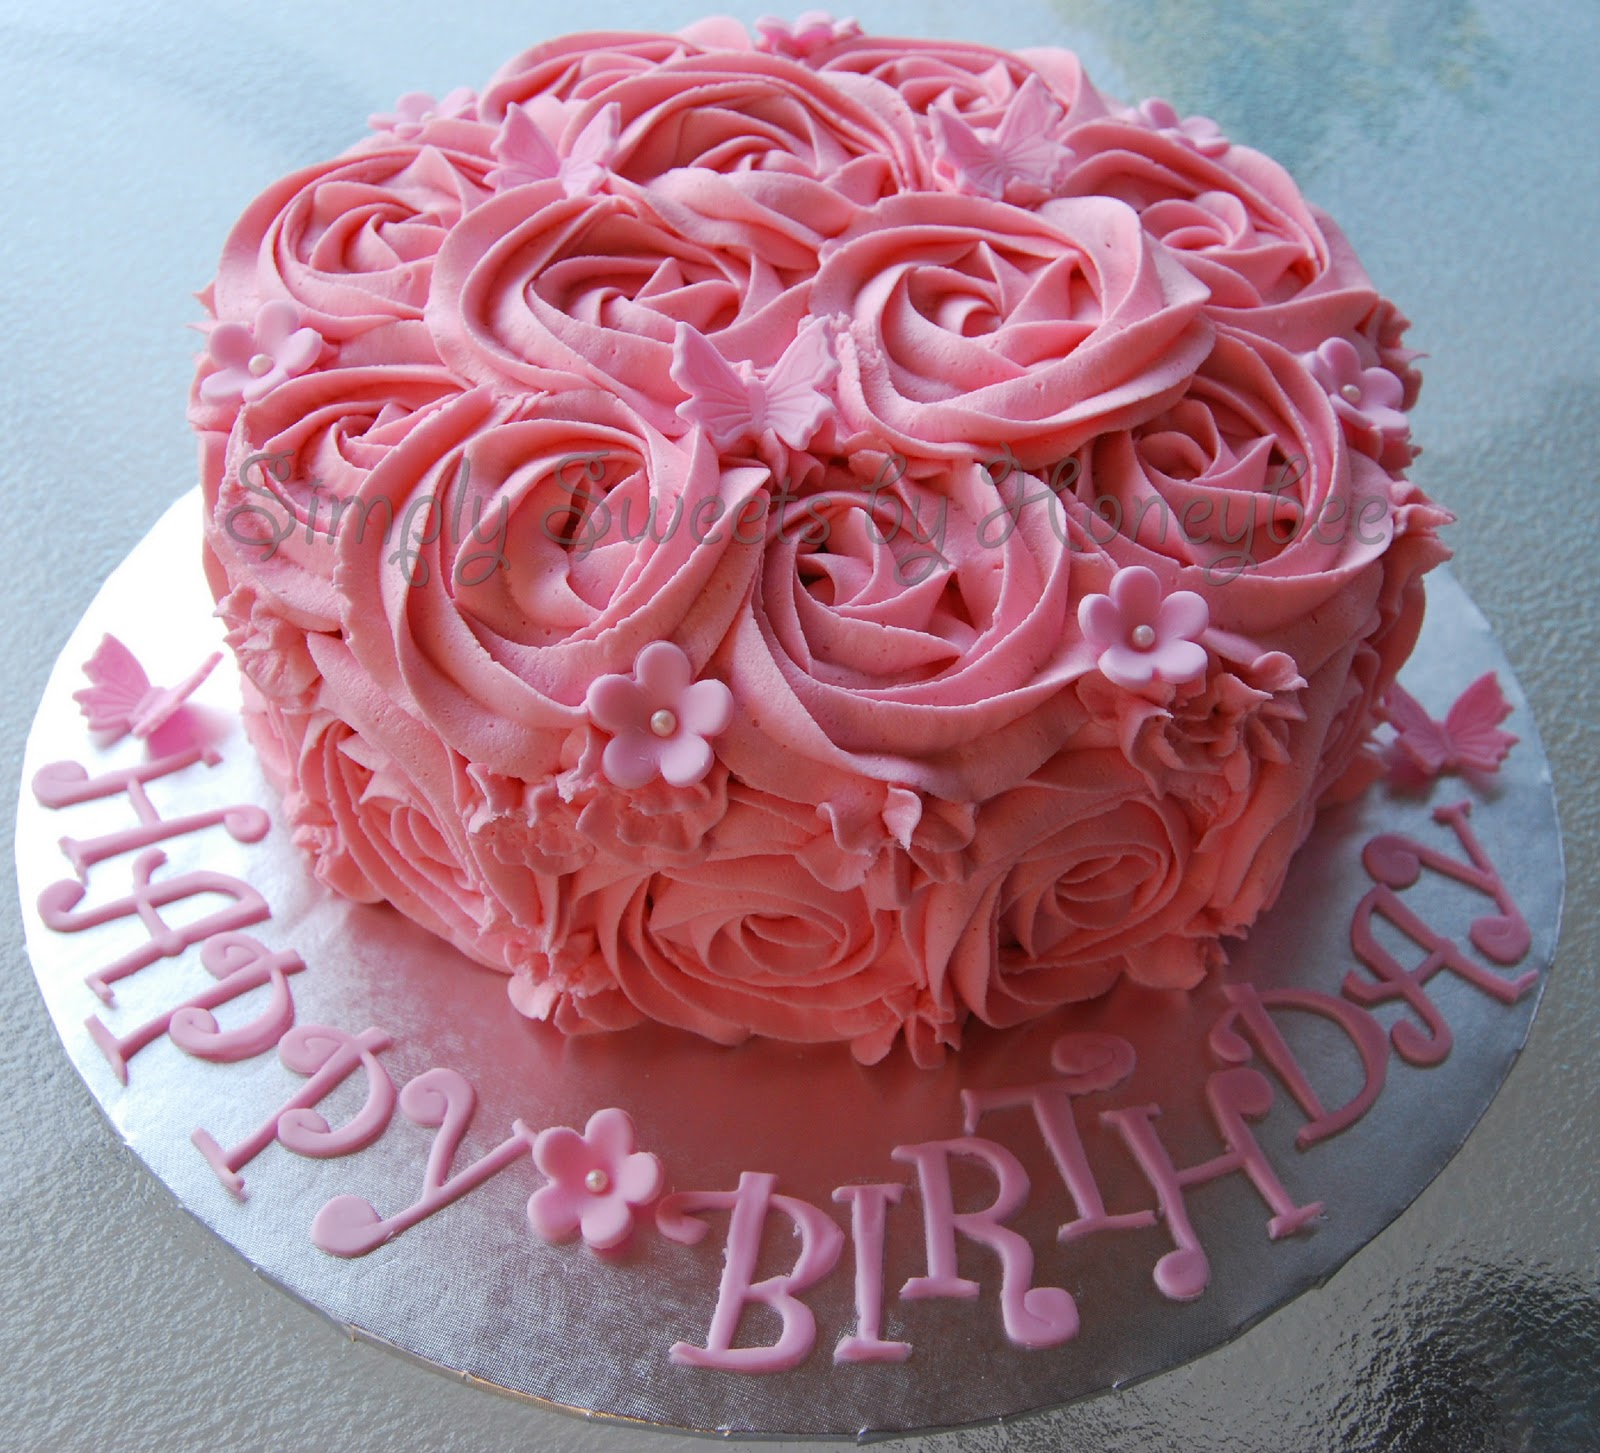 Two Birthday Cakes - simplysweetsbyhoneybee.com